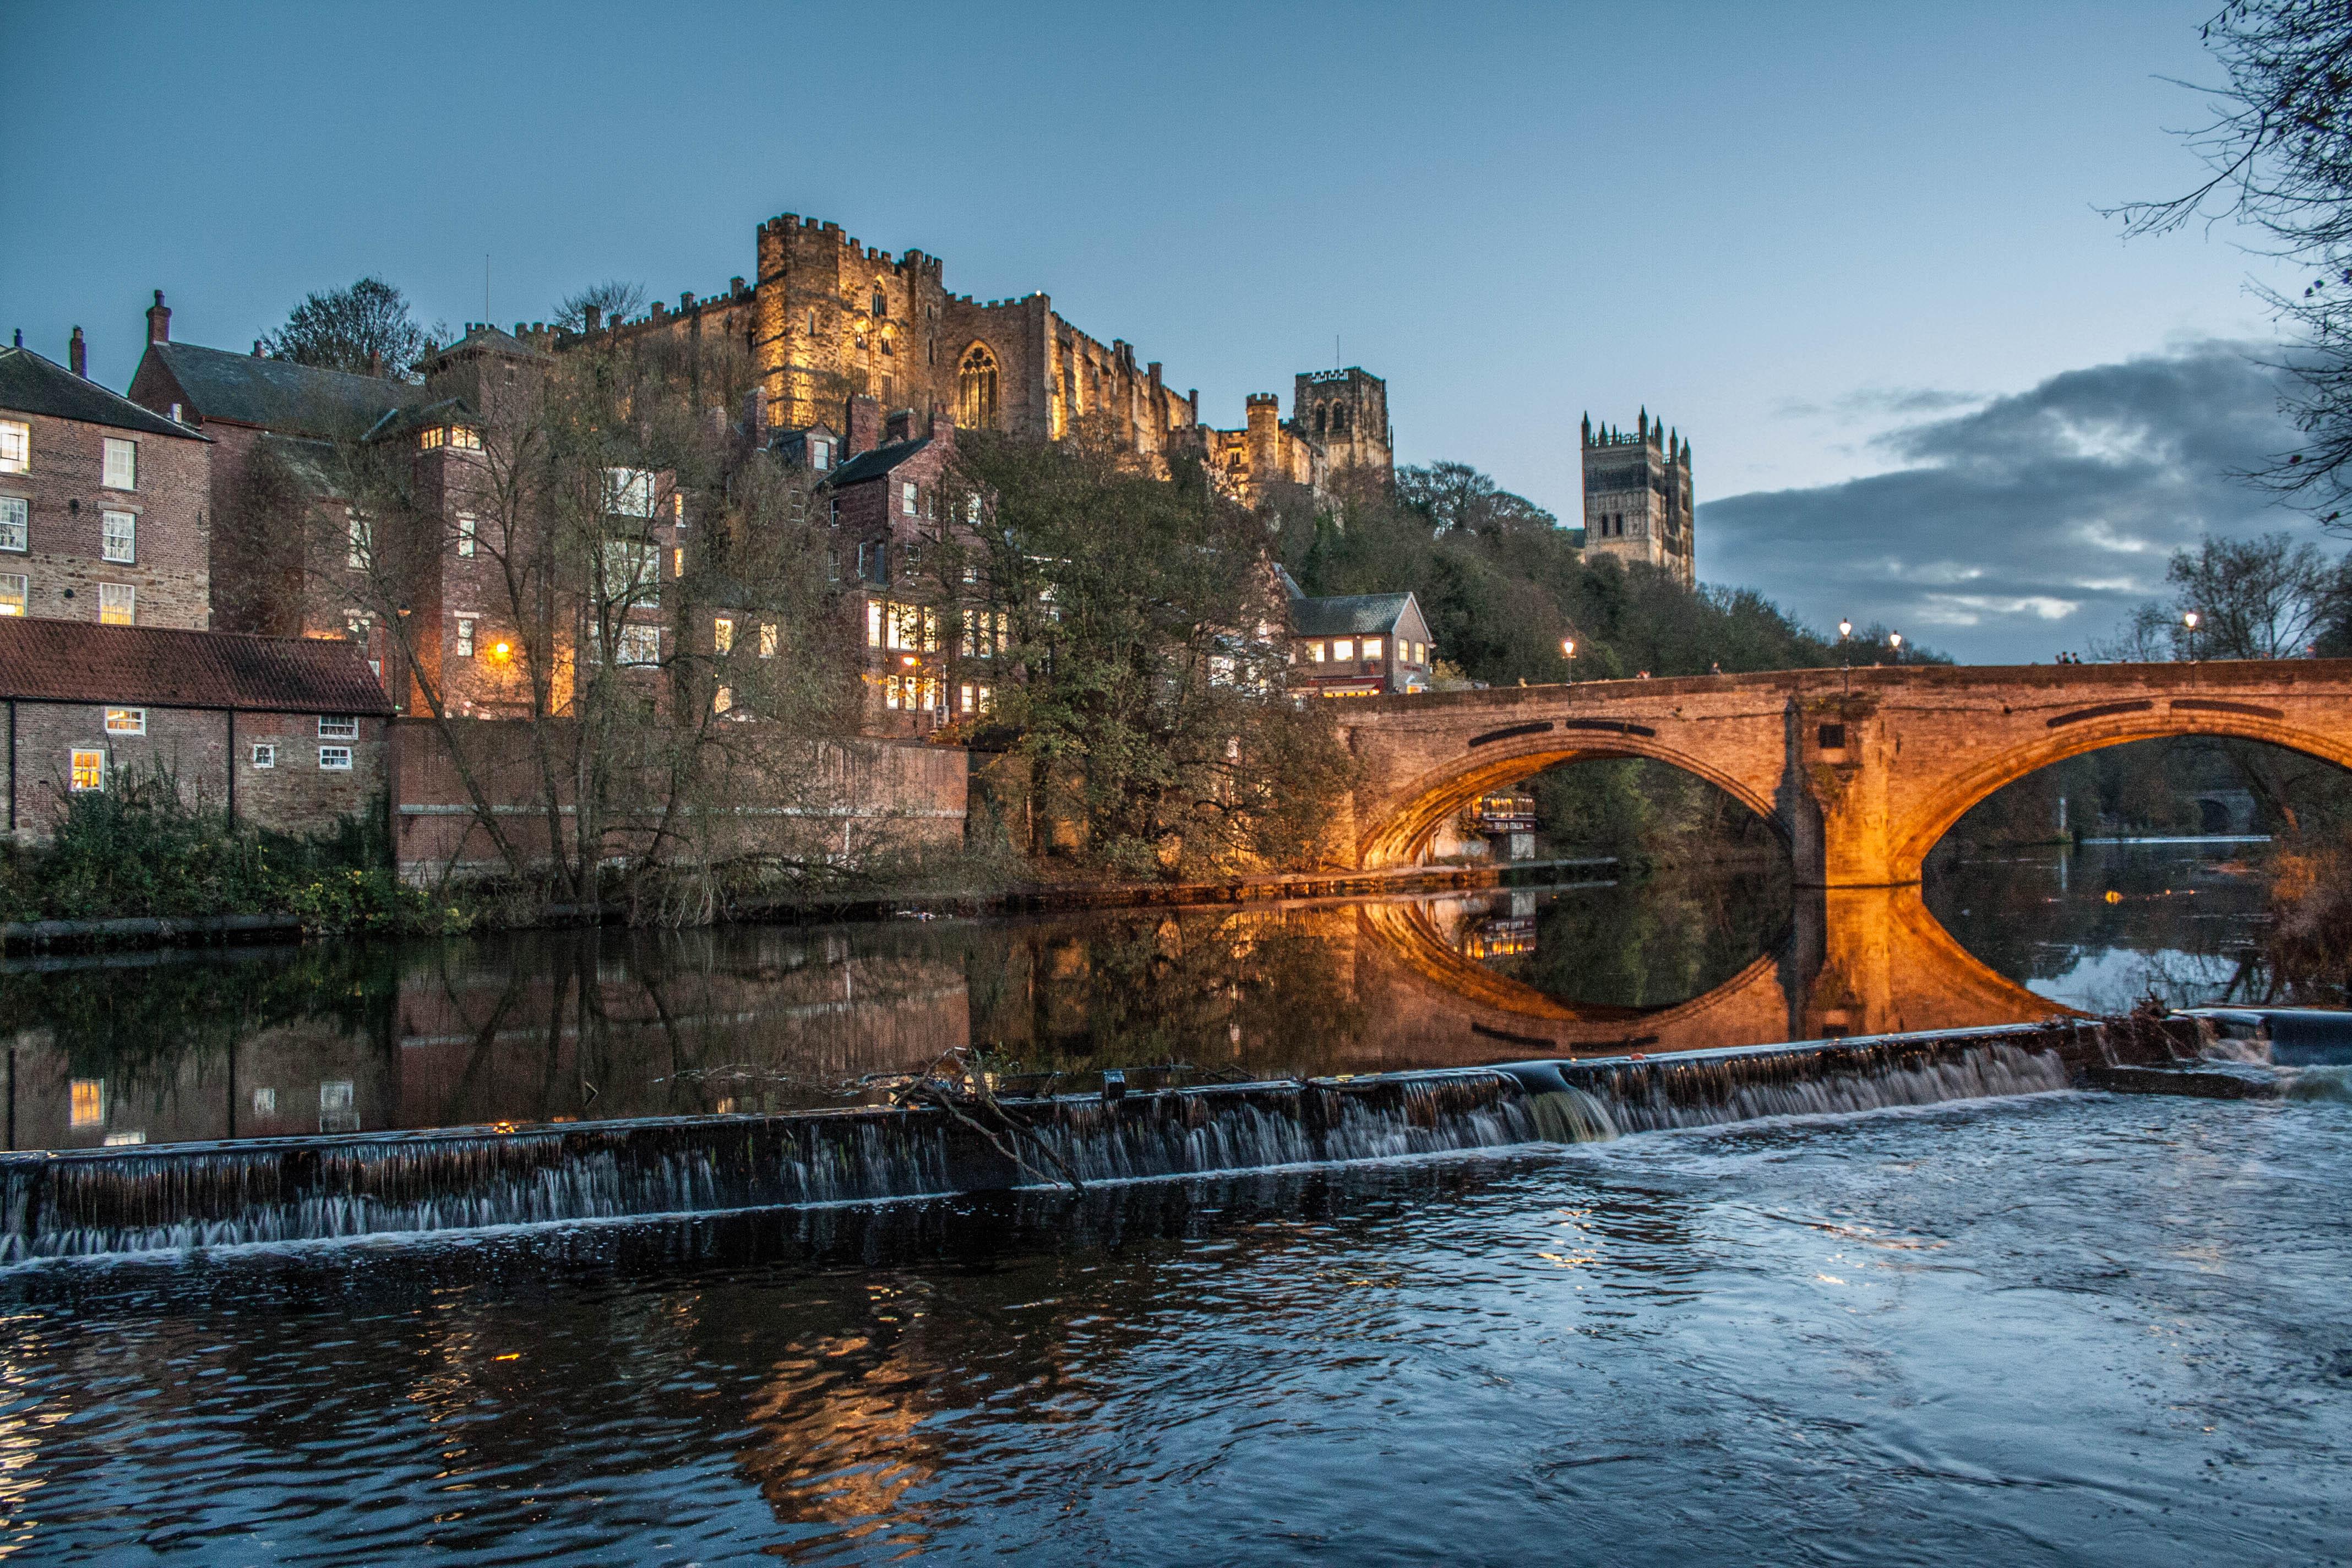 Wallpaper City Uk England Water River Cityscape Durham